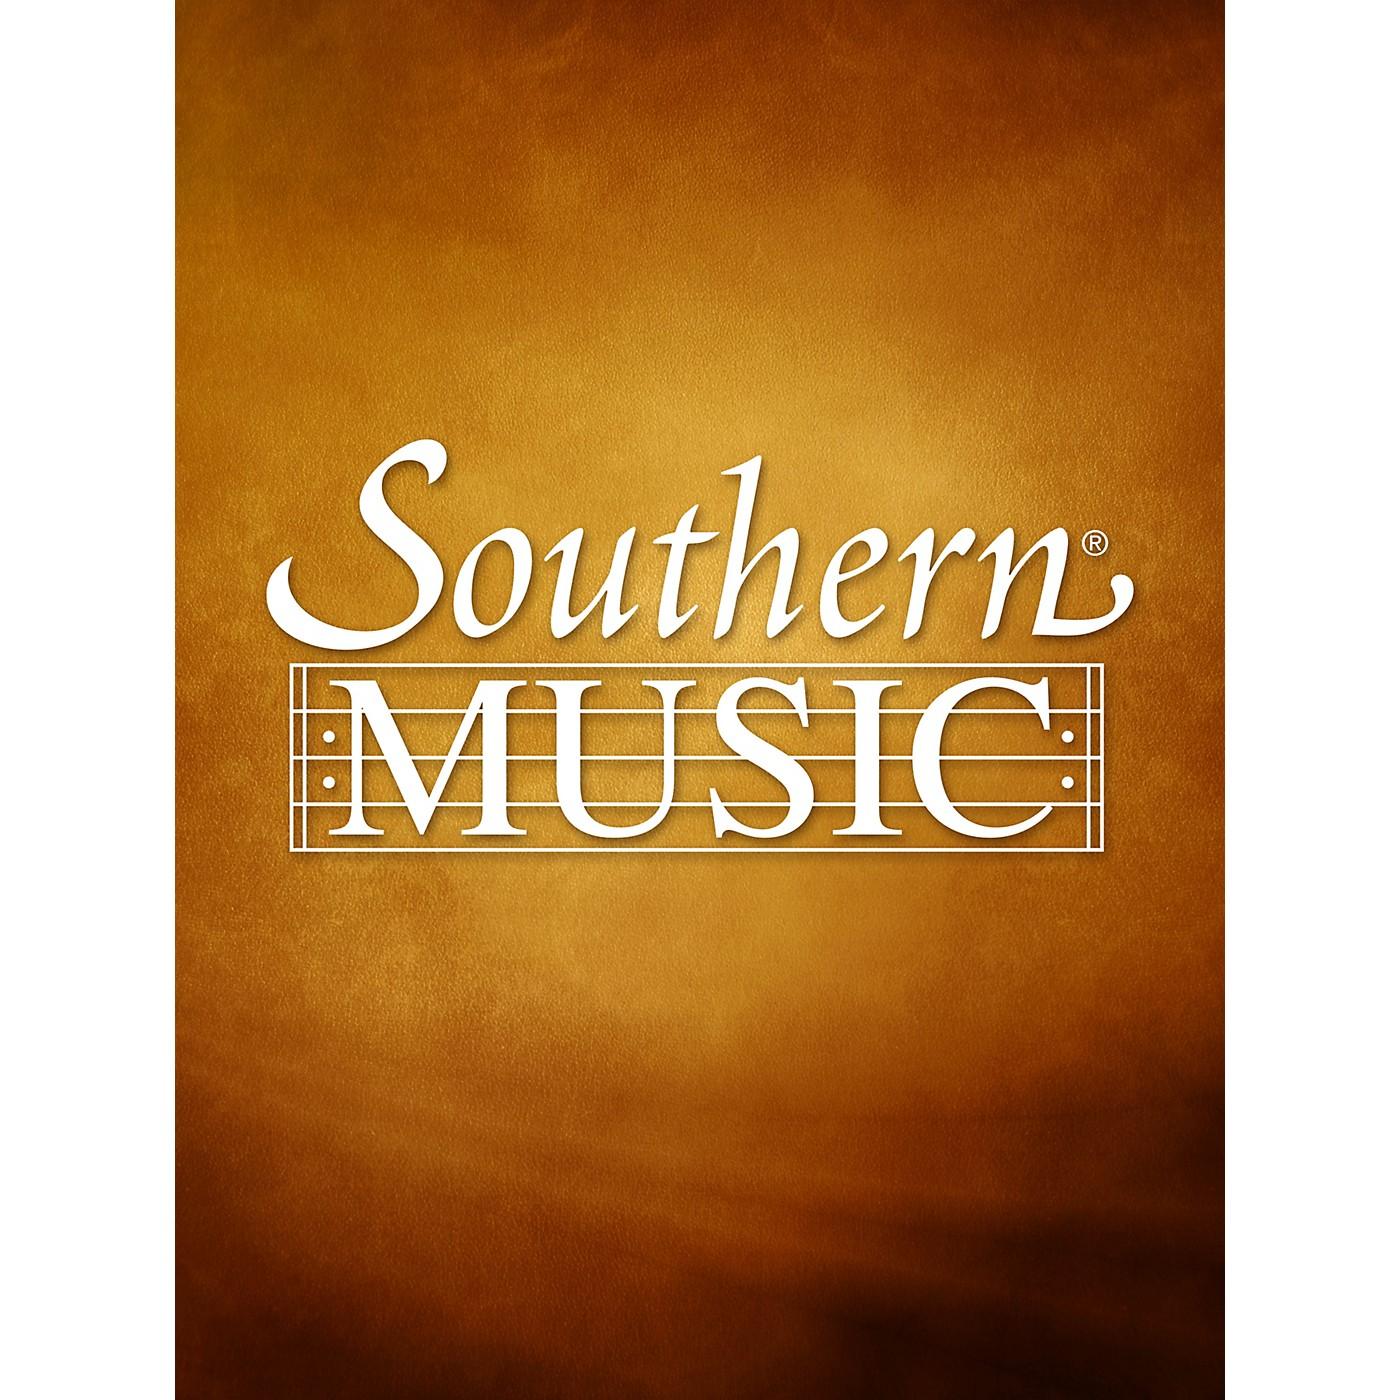 Southern Shadowcatcher (Brass Quintet and Wind Ensemble Study Score) Concert Band Level 5 Composed by Eric Ewazen thumbnail